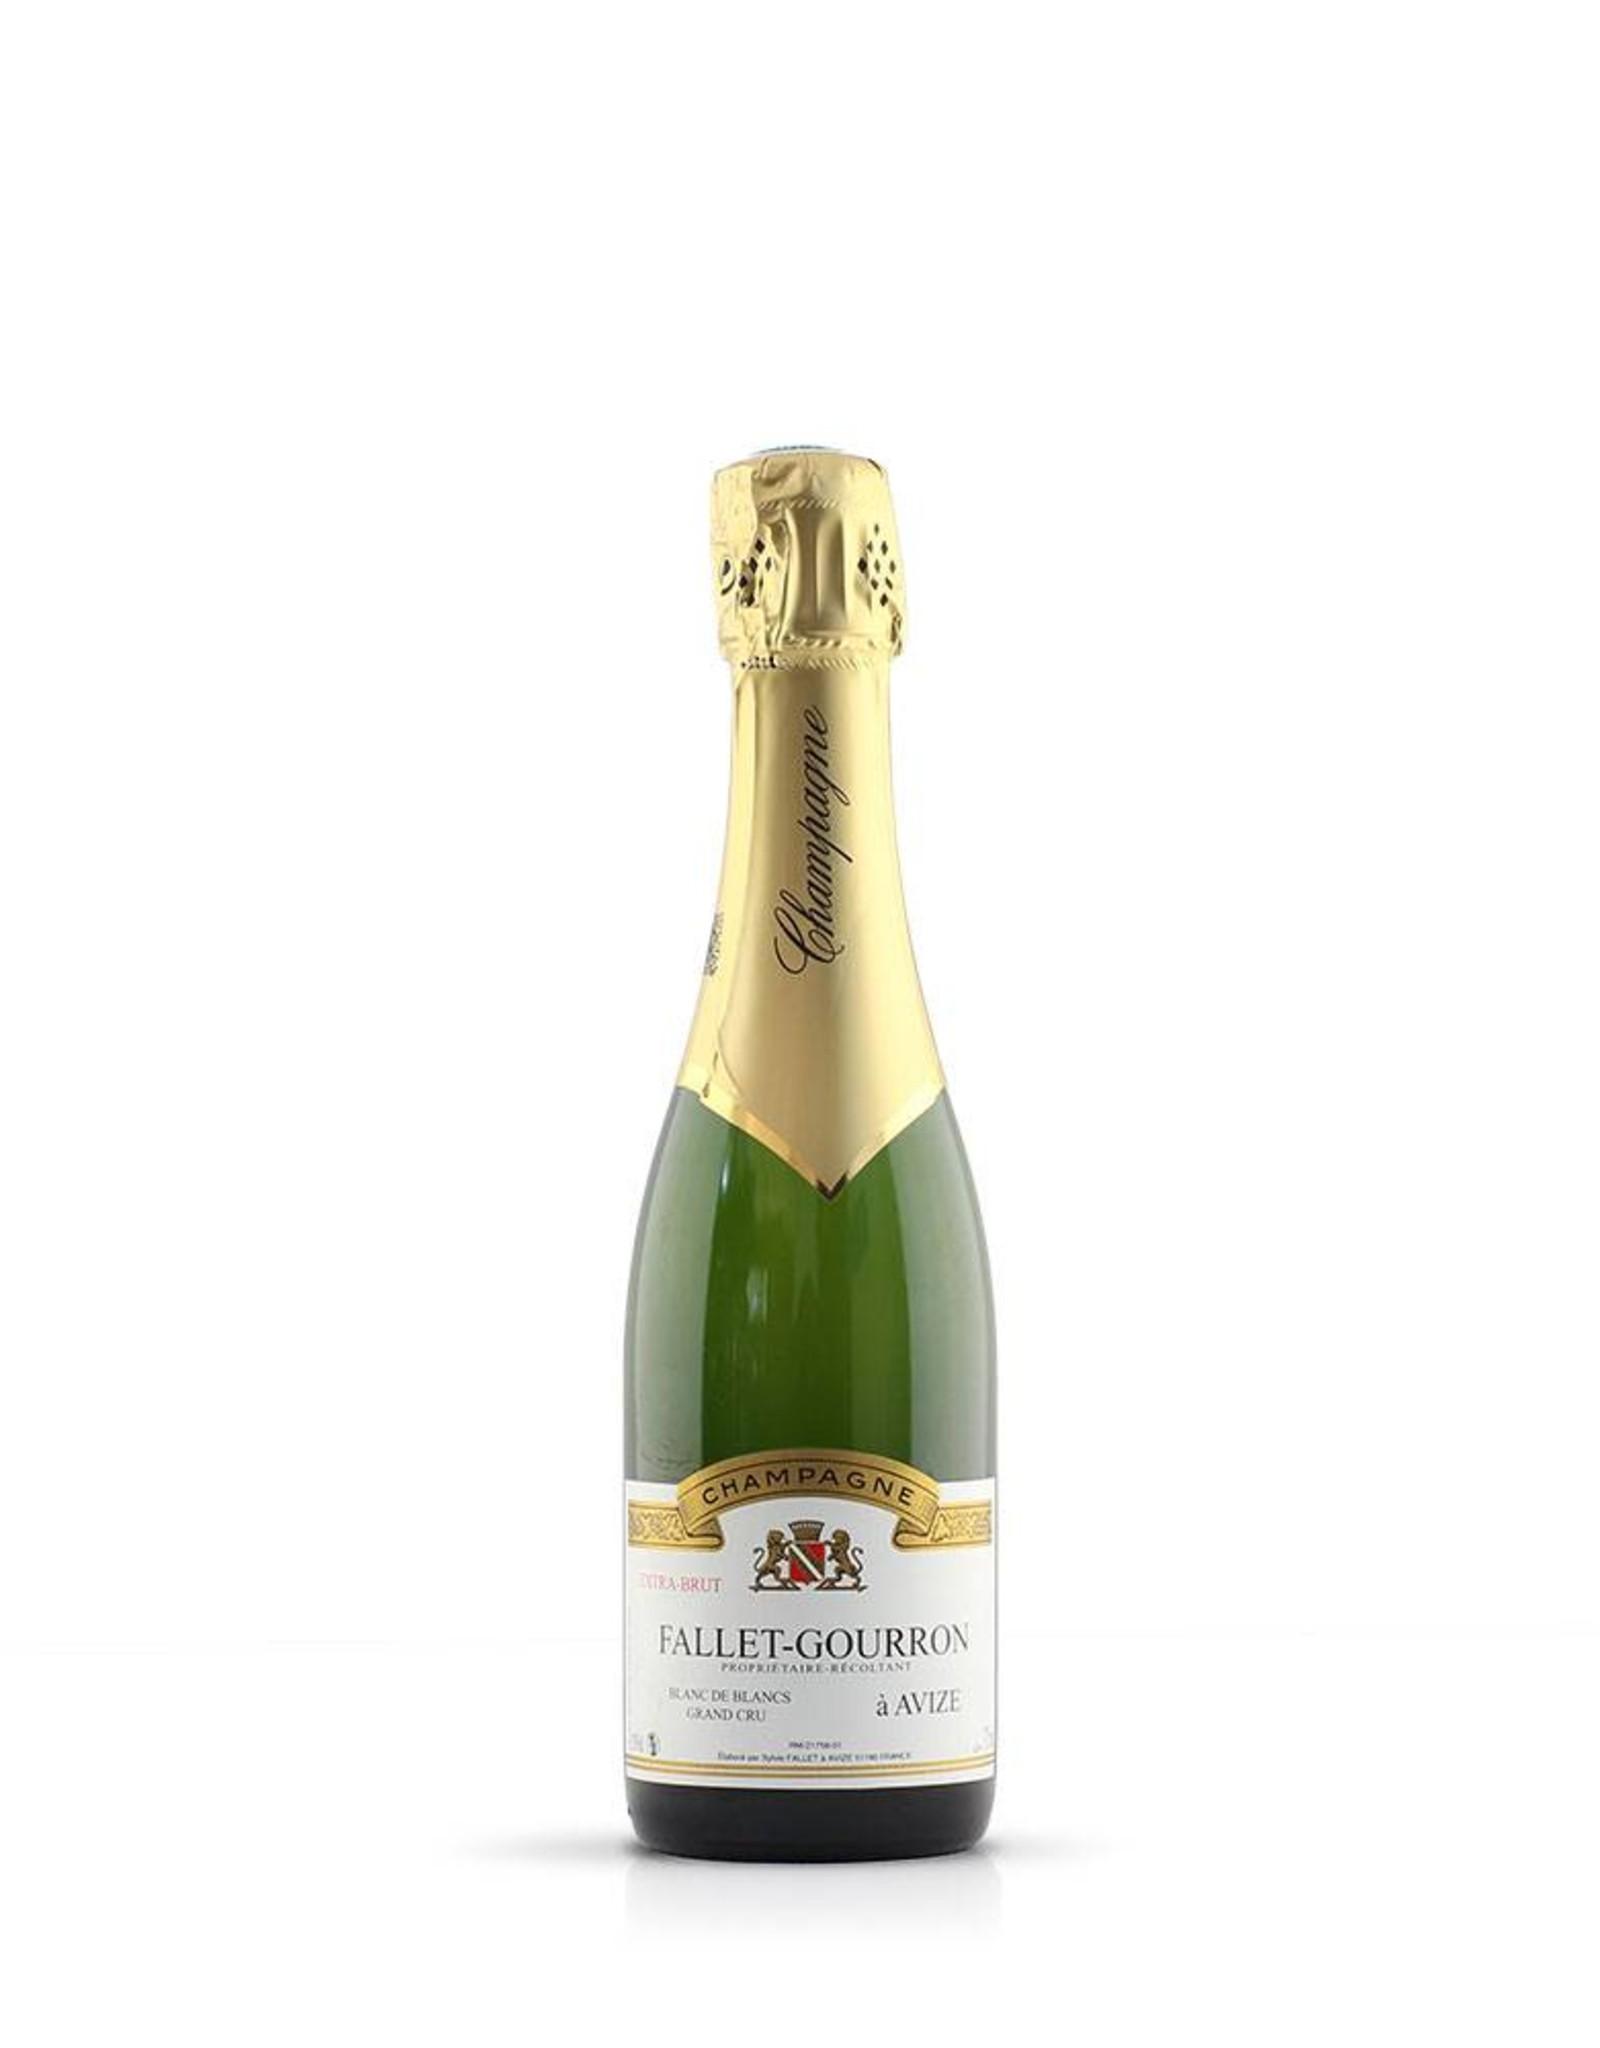 Fallet -Gourron Champagne Grand Cru Blanc de Blancs Extra Brut